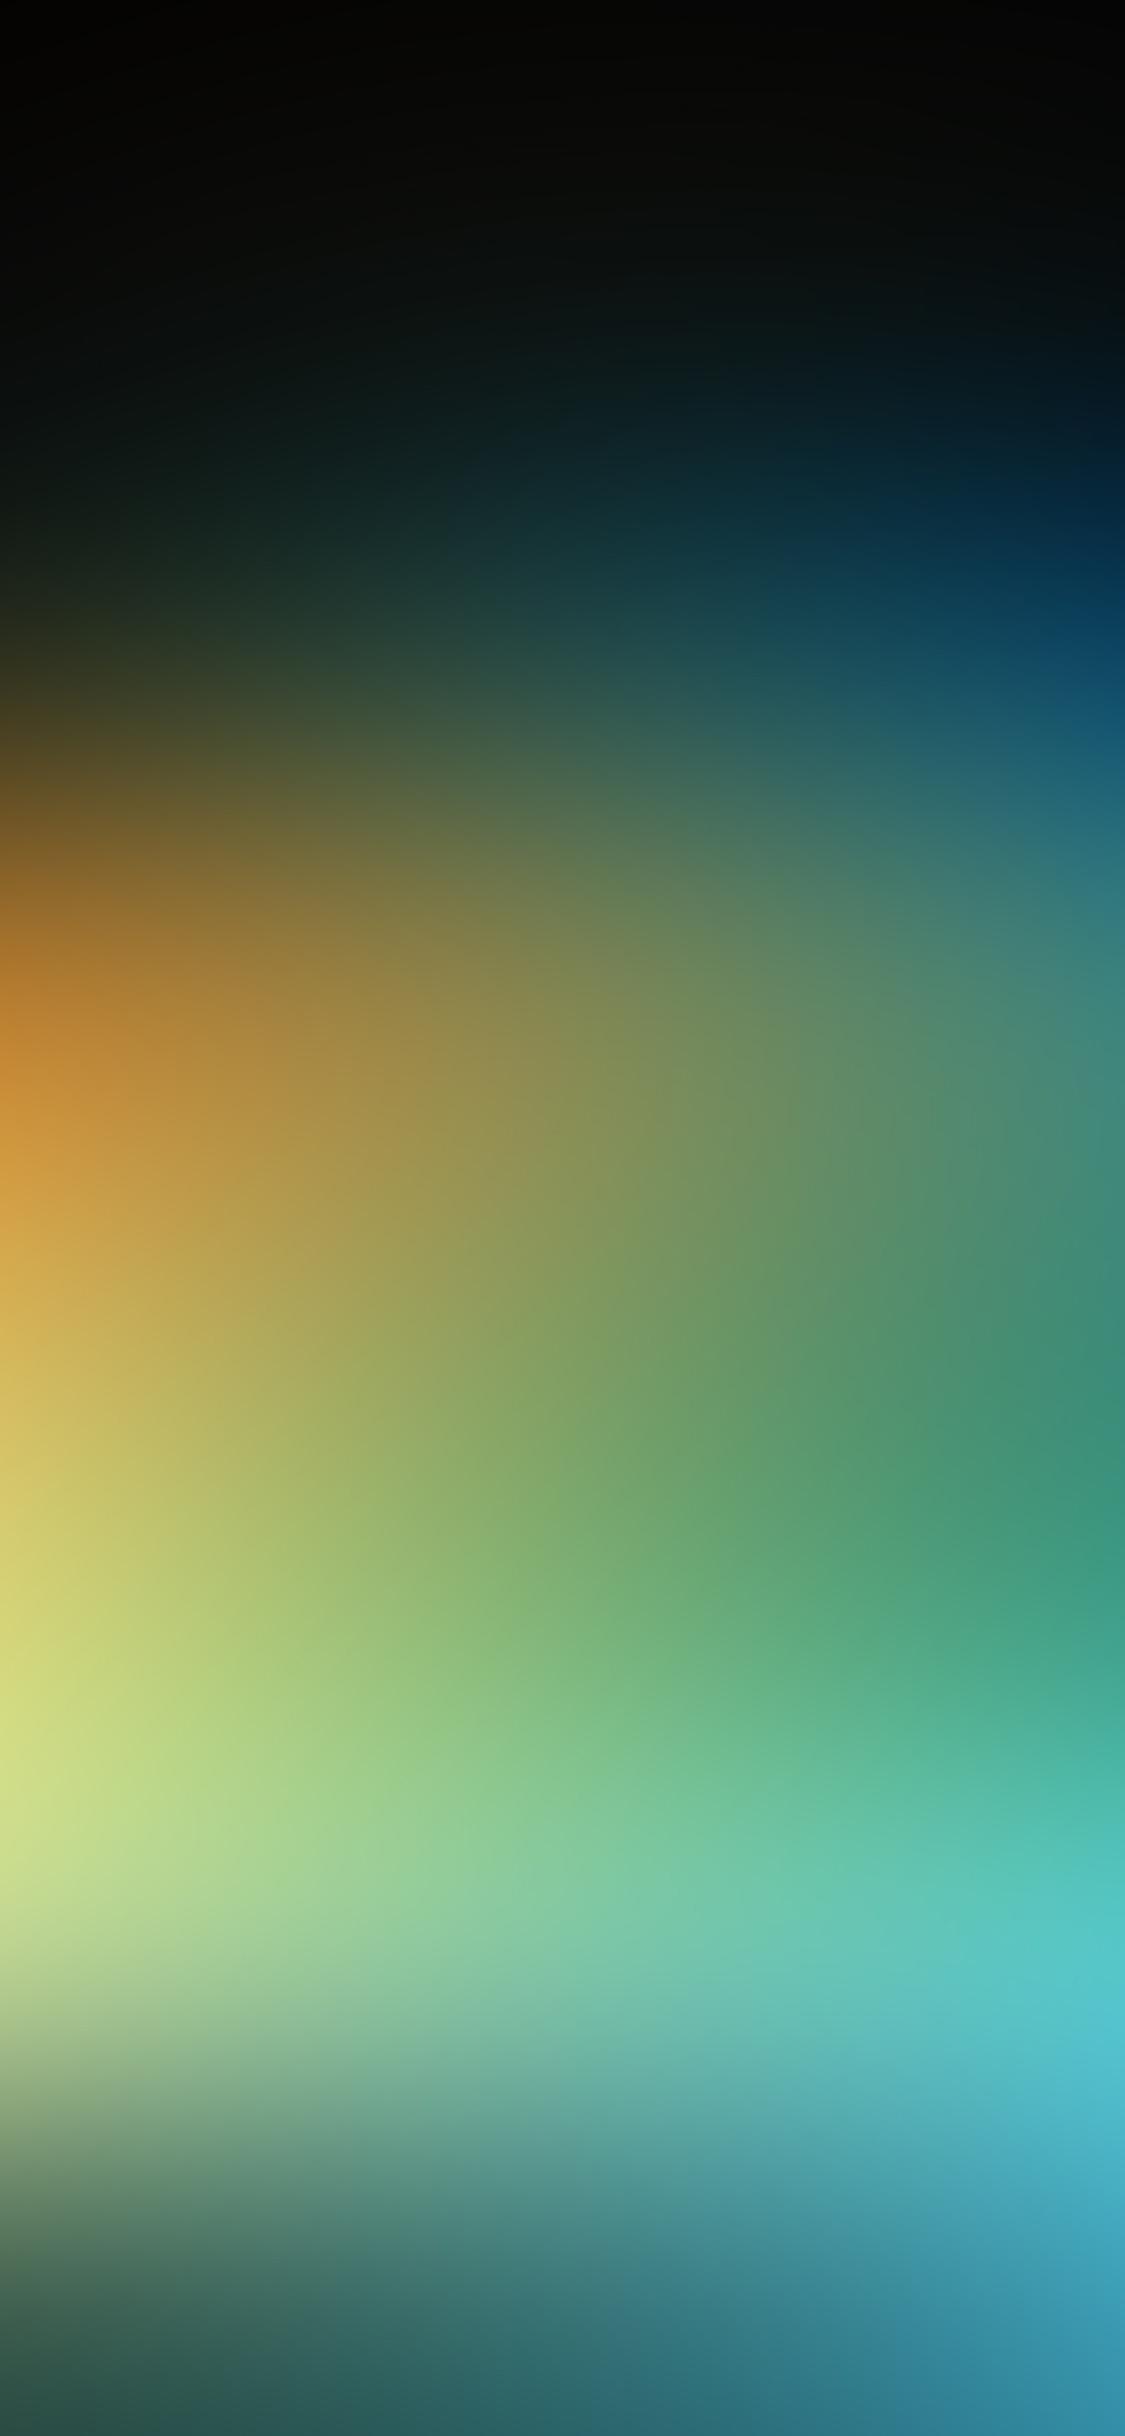 iPhoneXpapers.com-Apple-iPhone-wallpaper-sj40-soft-blue-night-shine-gradation-blur